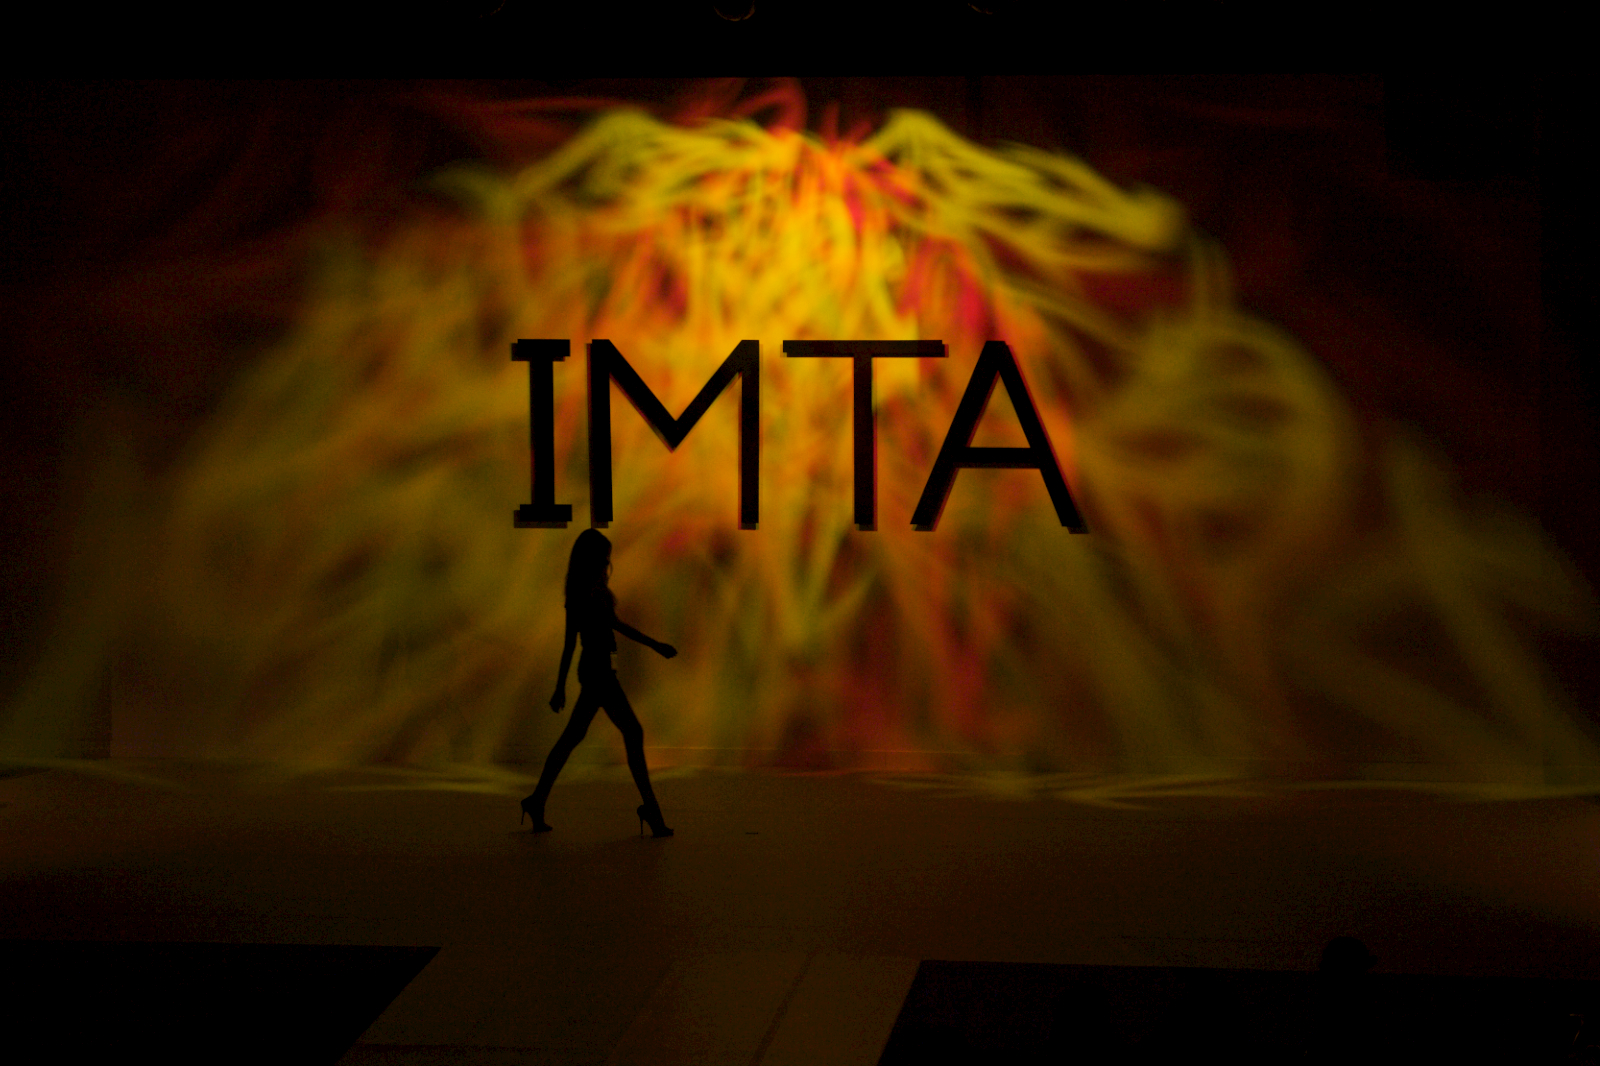 IMTA 2011  3.jpg